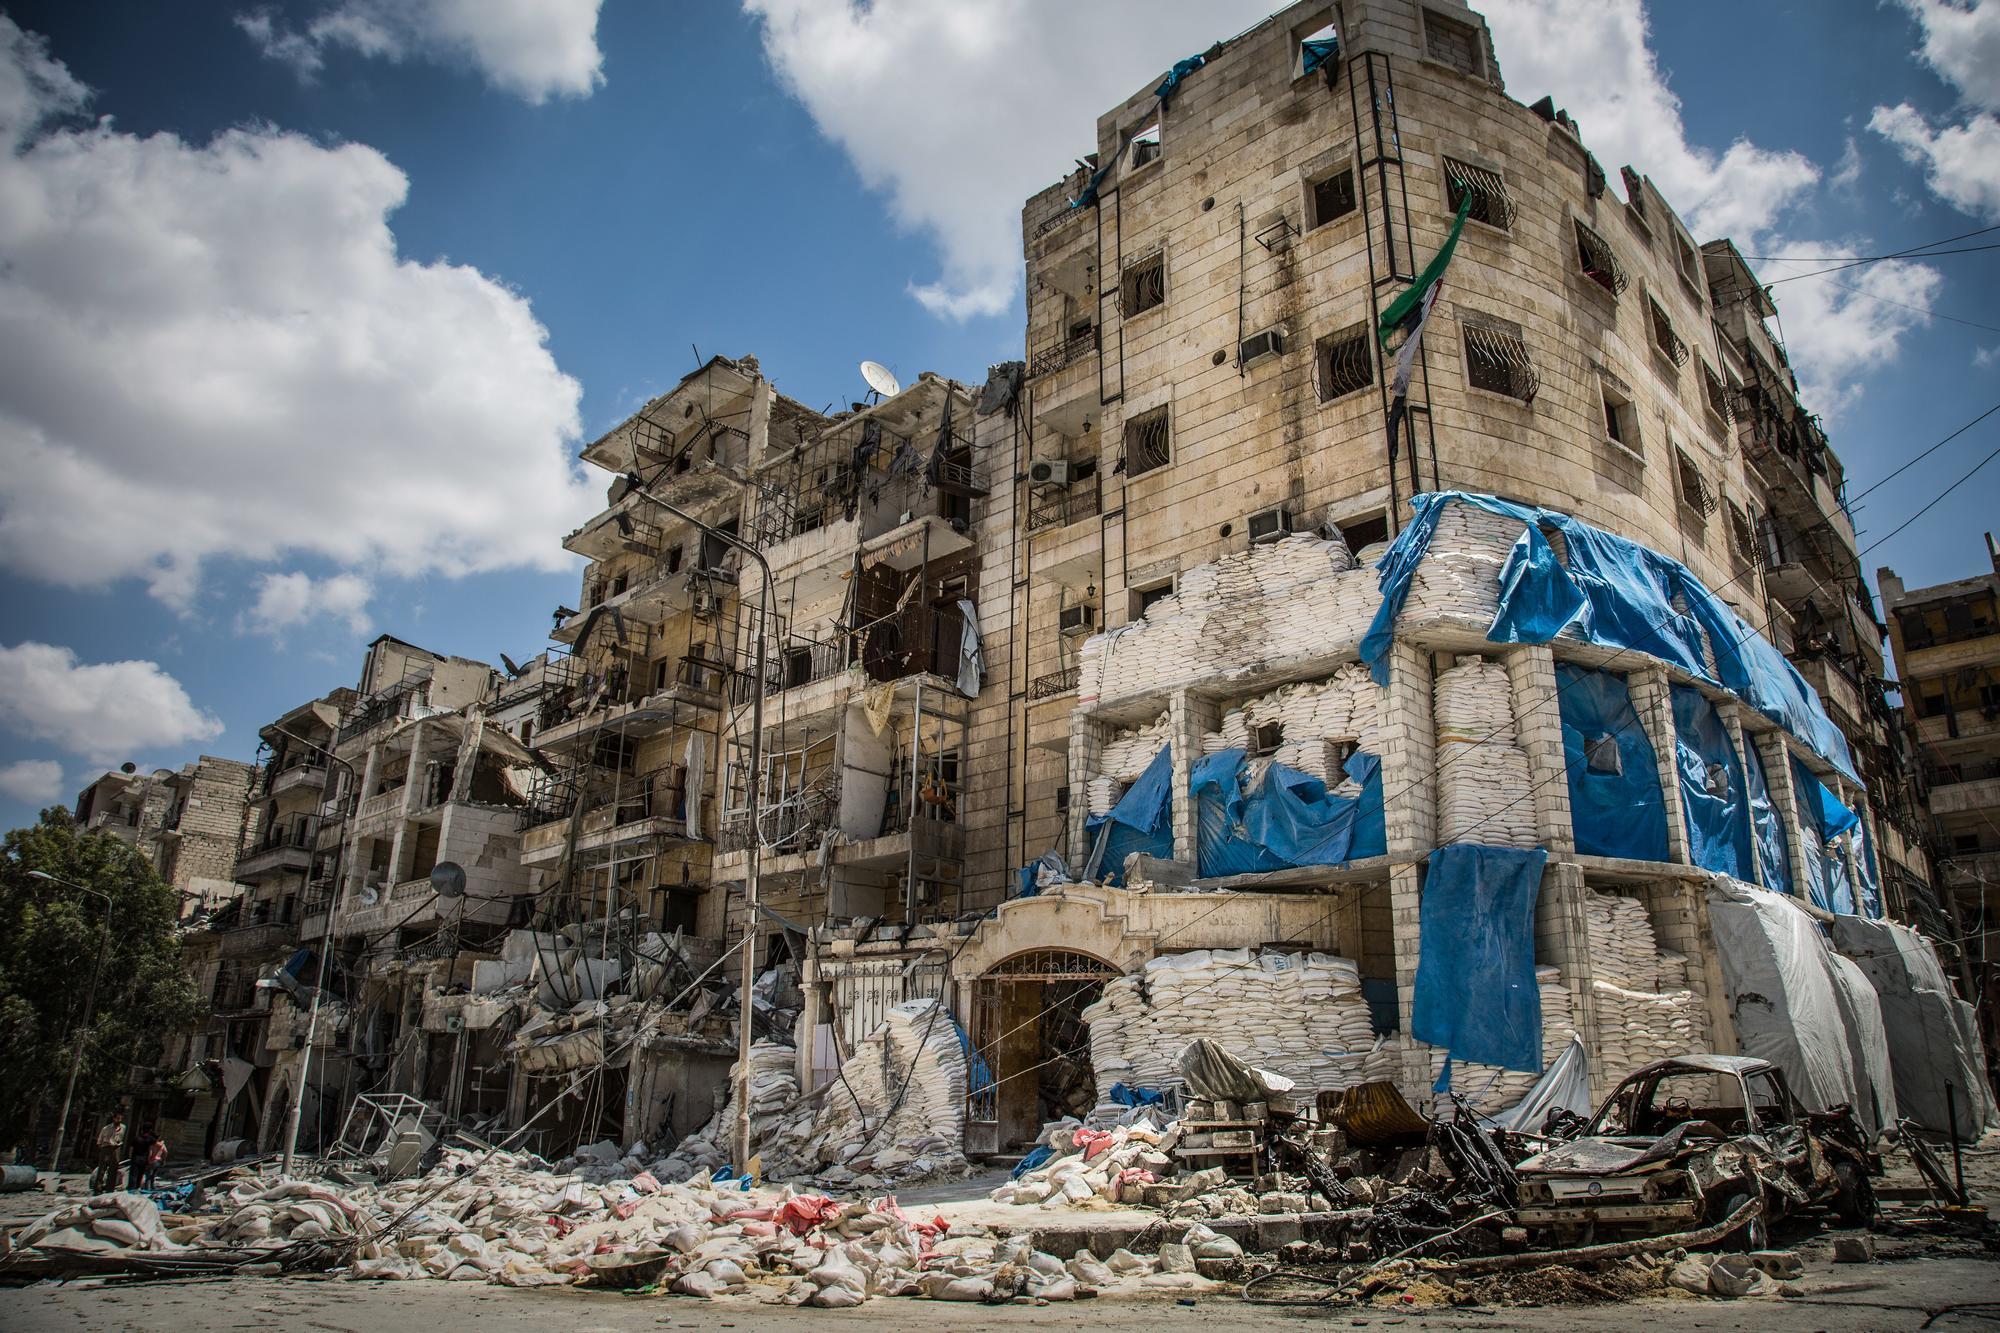 A decade of devastation